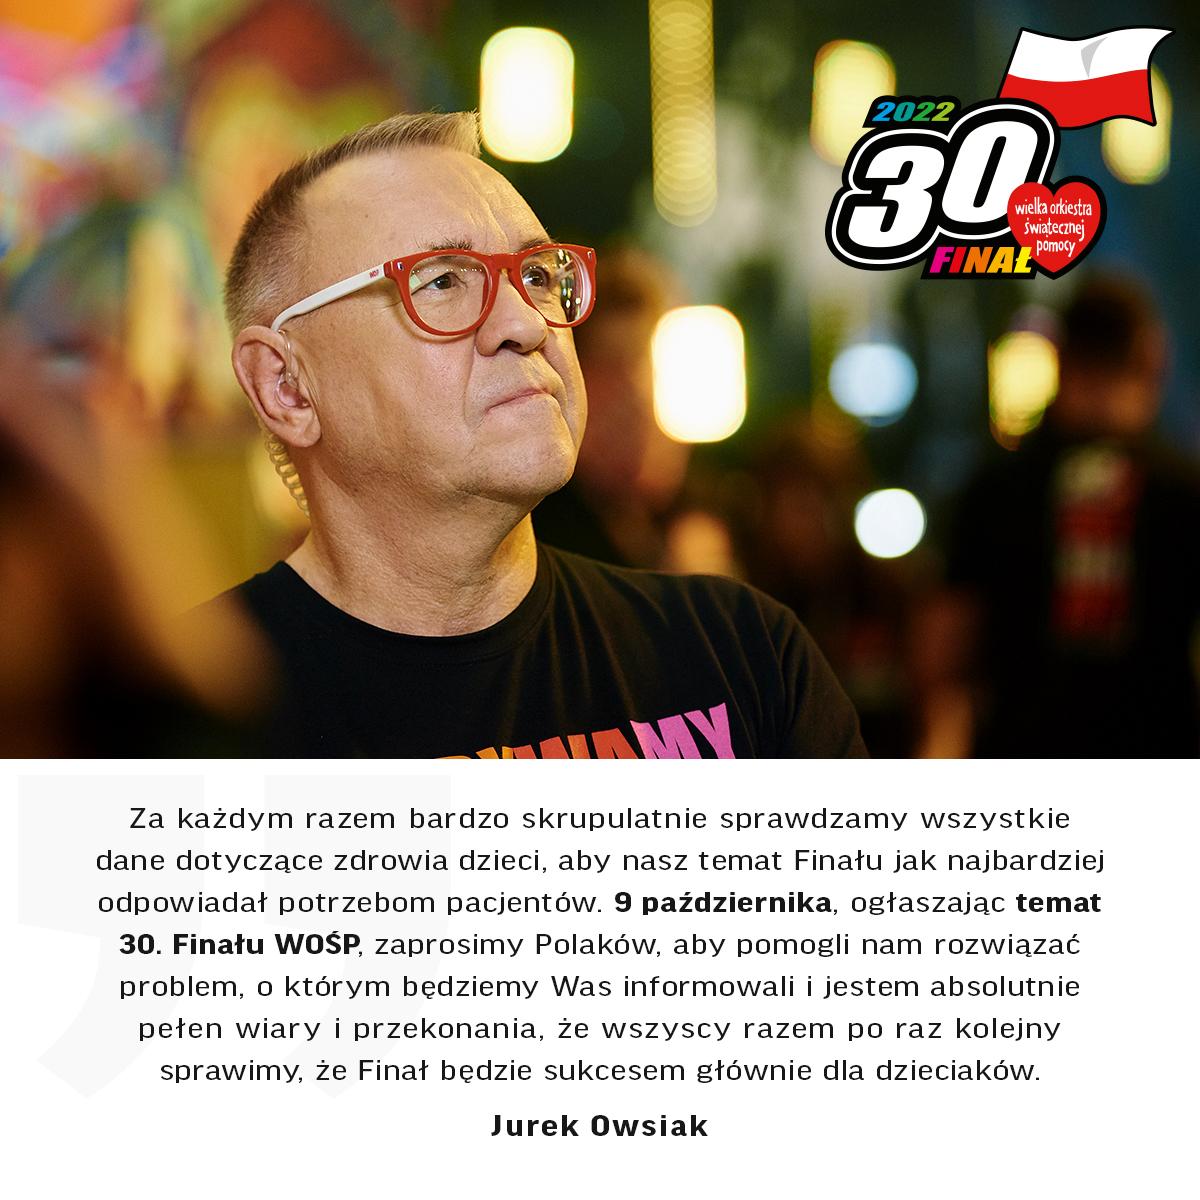 Jurek Owsiak o 30. Finale WOŚP